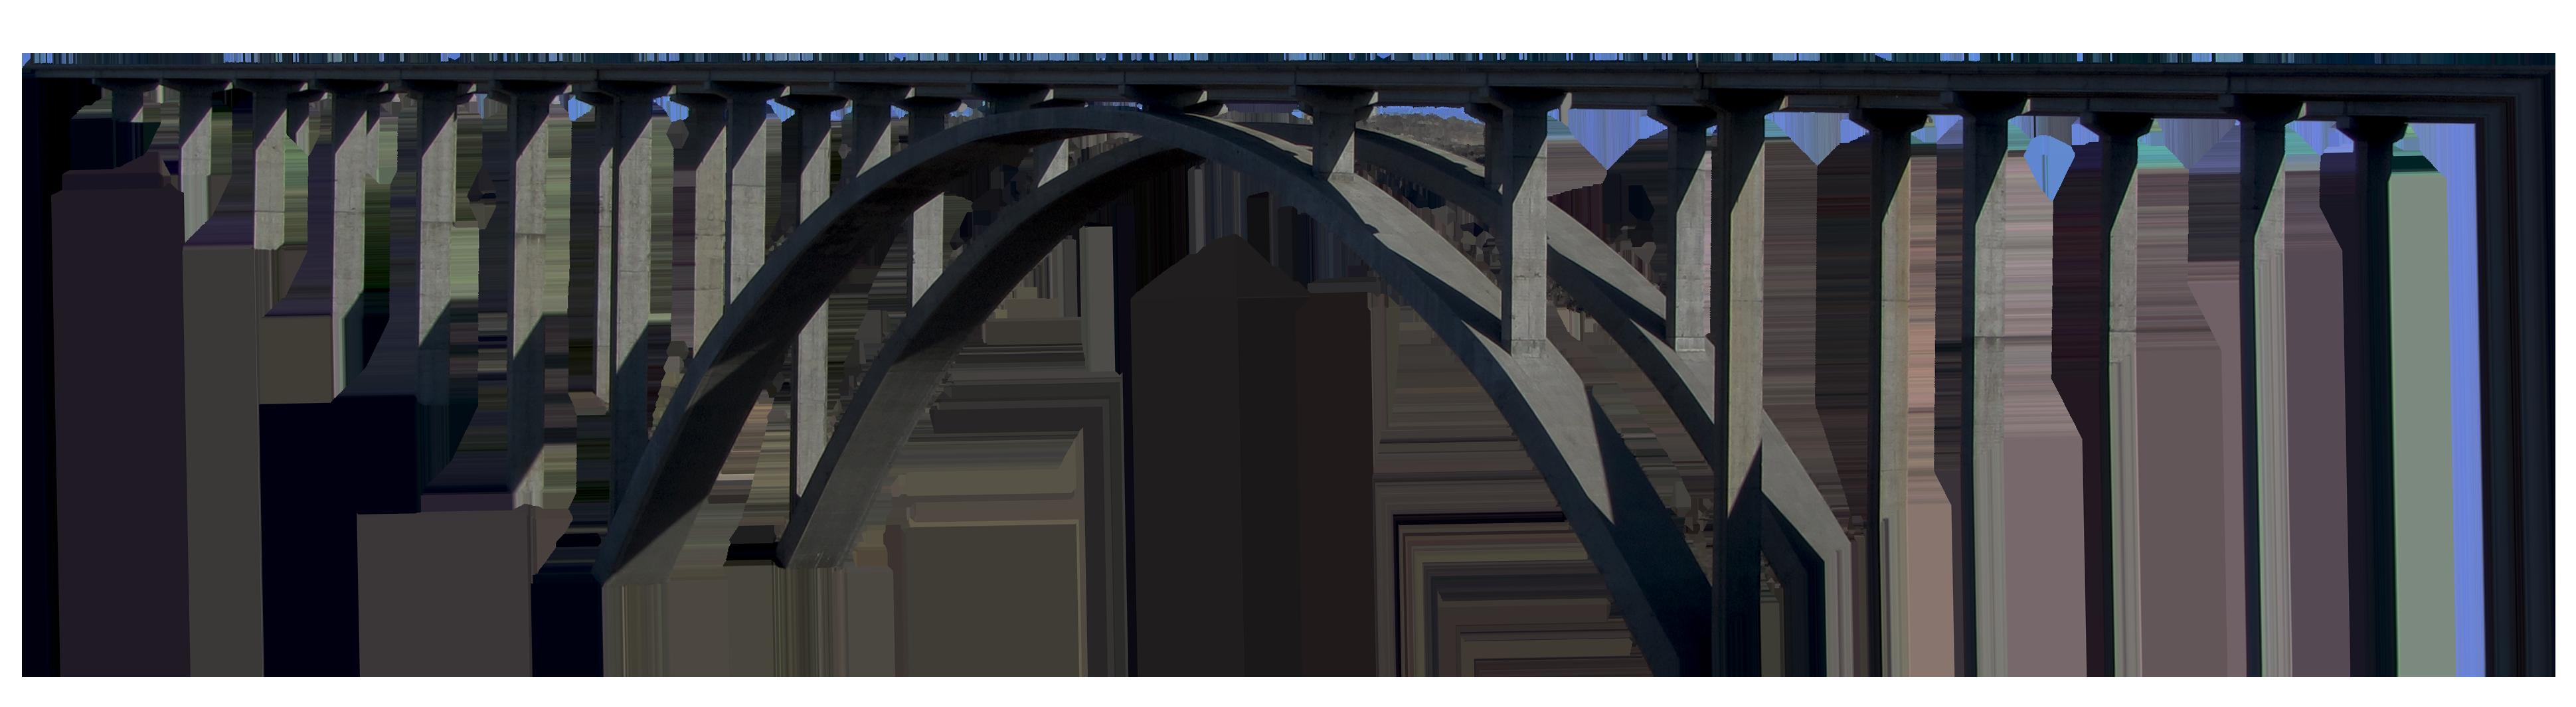 Bridge clipart cut out. Concrete feb john lloyd